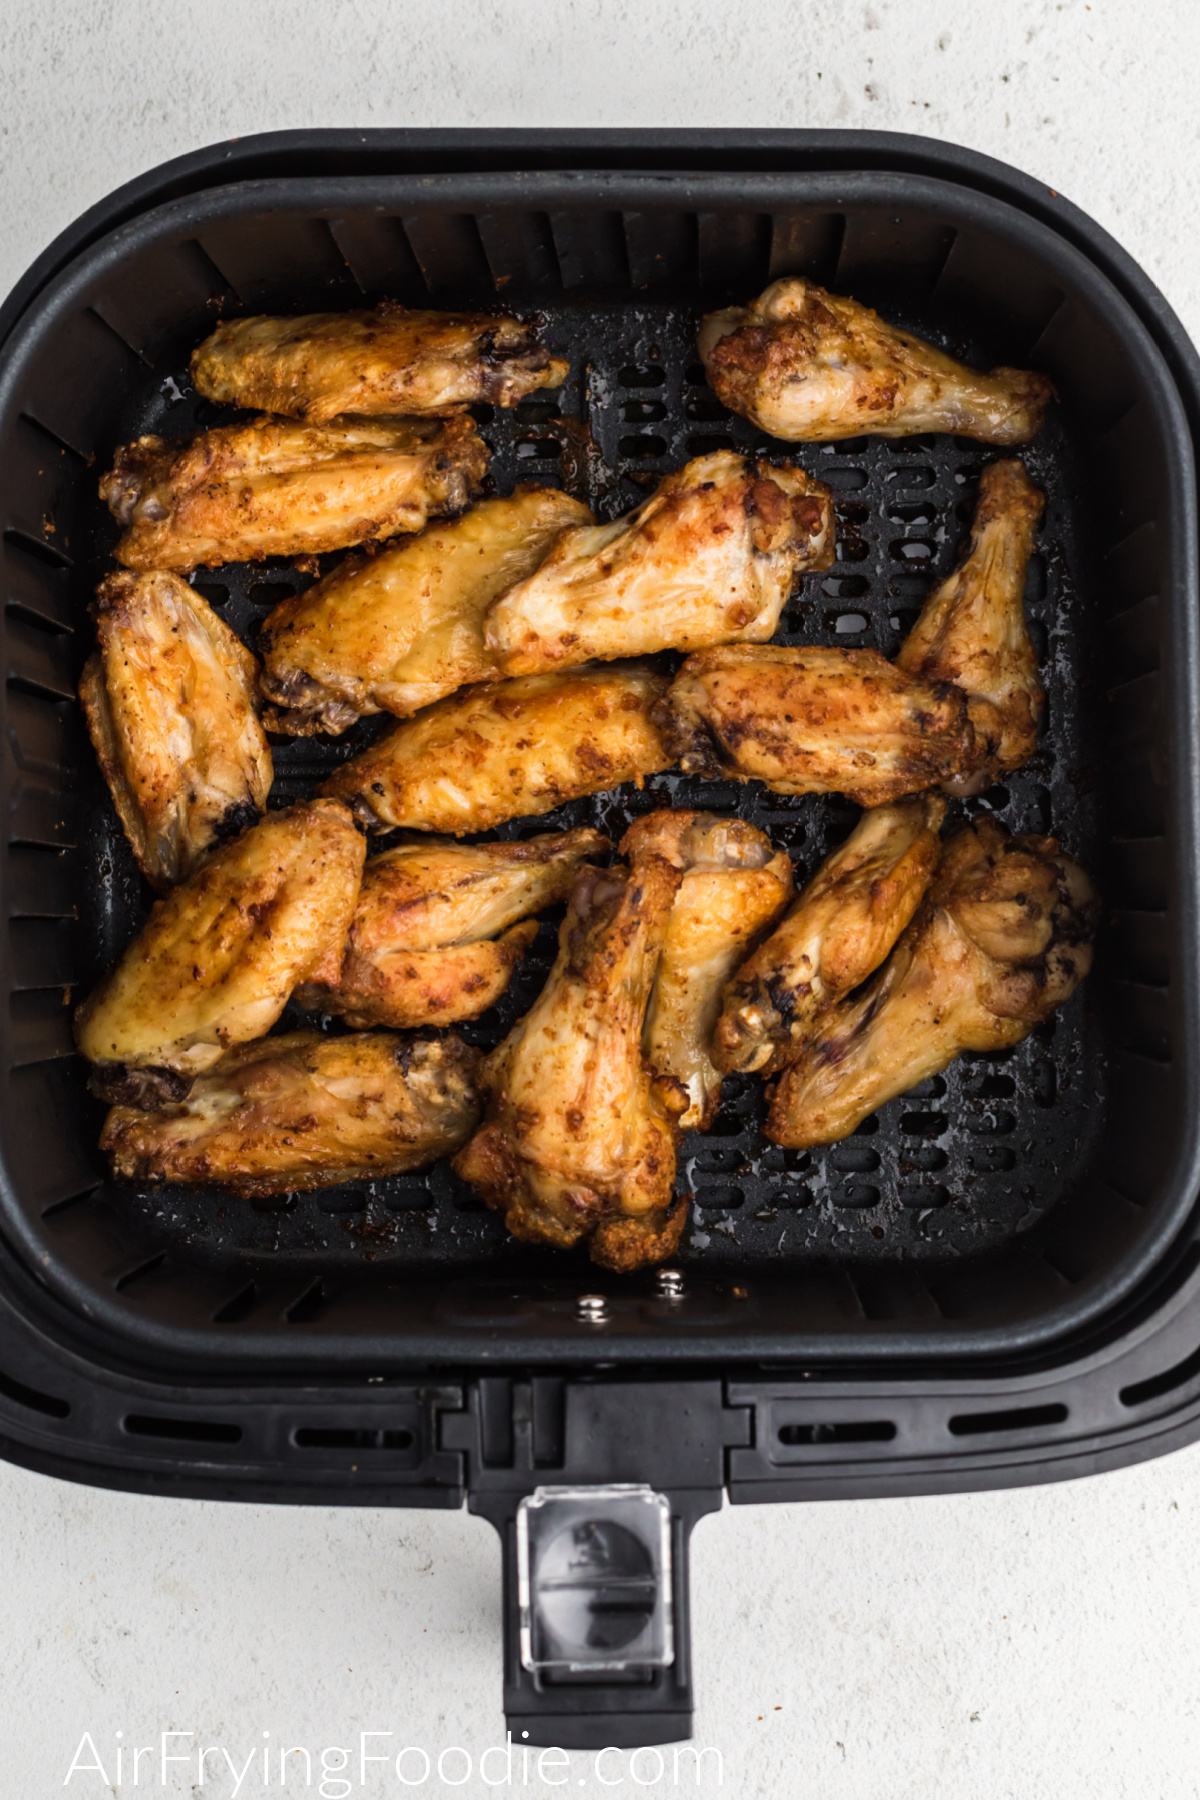 Air Fryer Garlic Parmesan Chicken Wings in the basket of the air fryer.